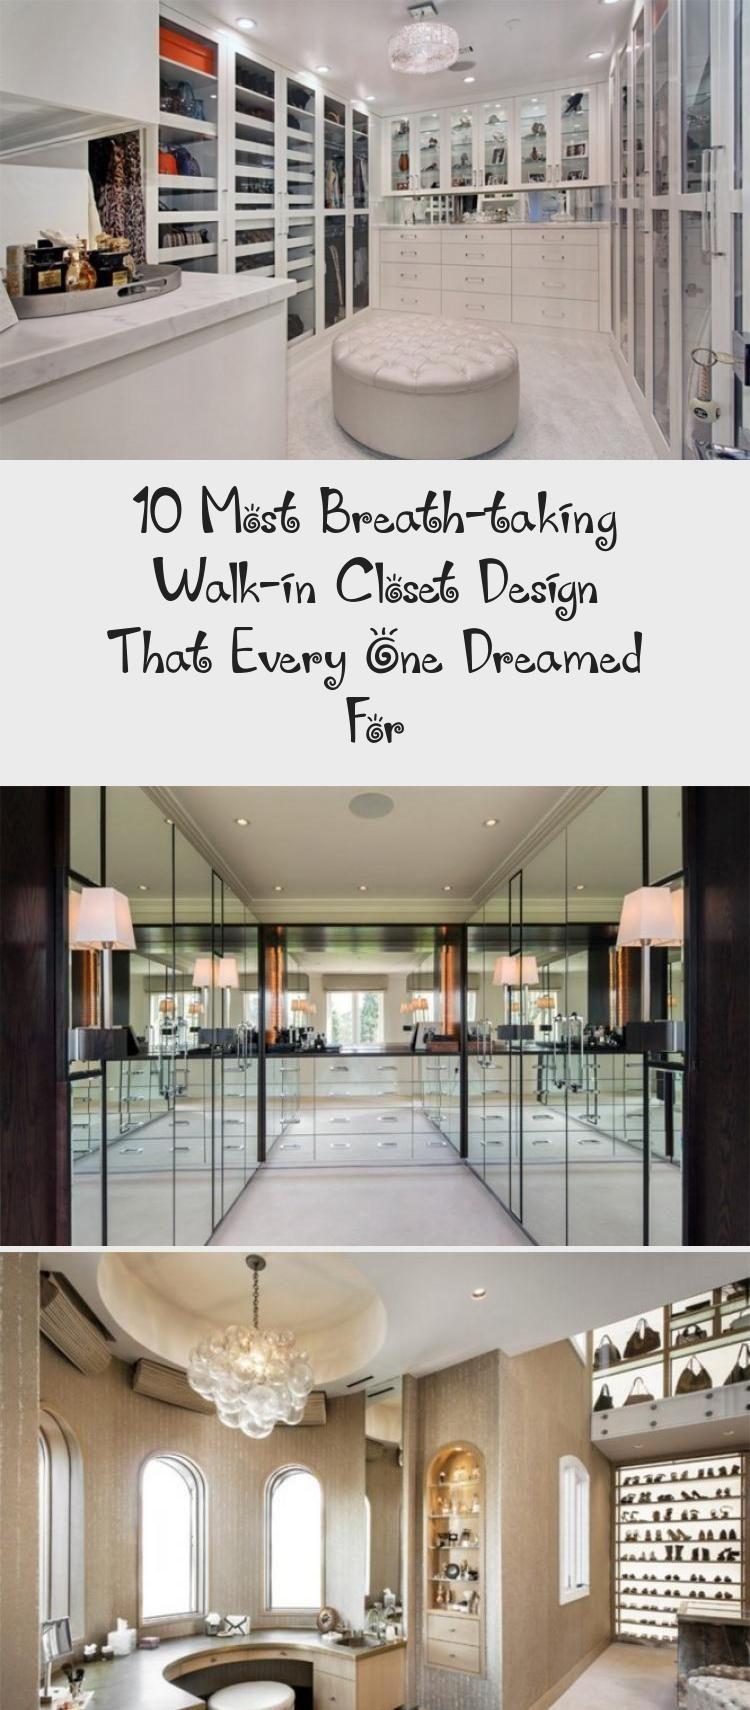 10 Most Breathtaking Walkin Closet Design That Every One Dreamed For 10 Most BreathTaking WalkIn Closet Design That Every One Dreamed For Design